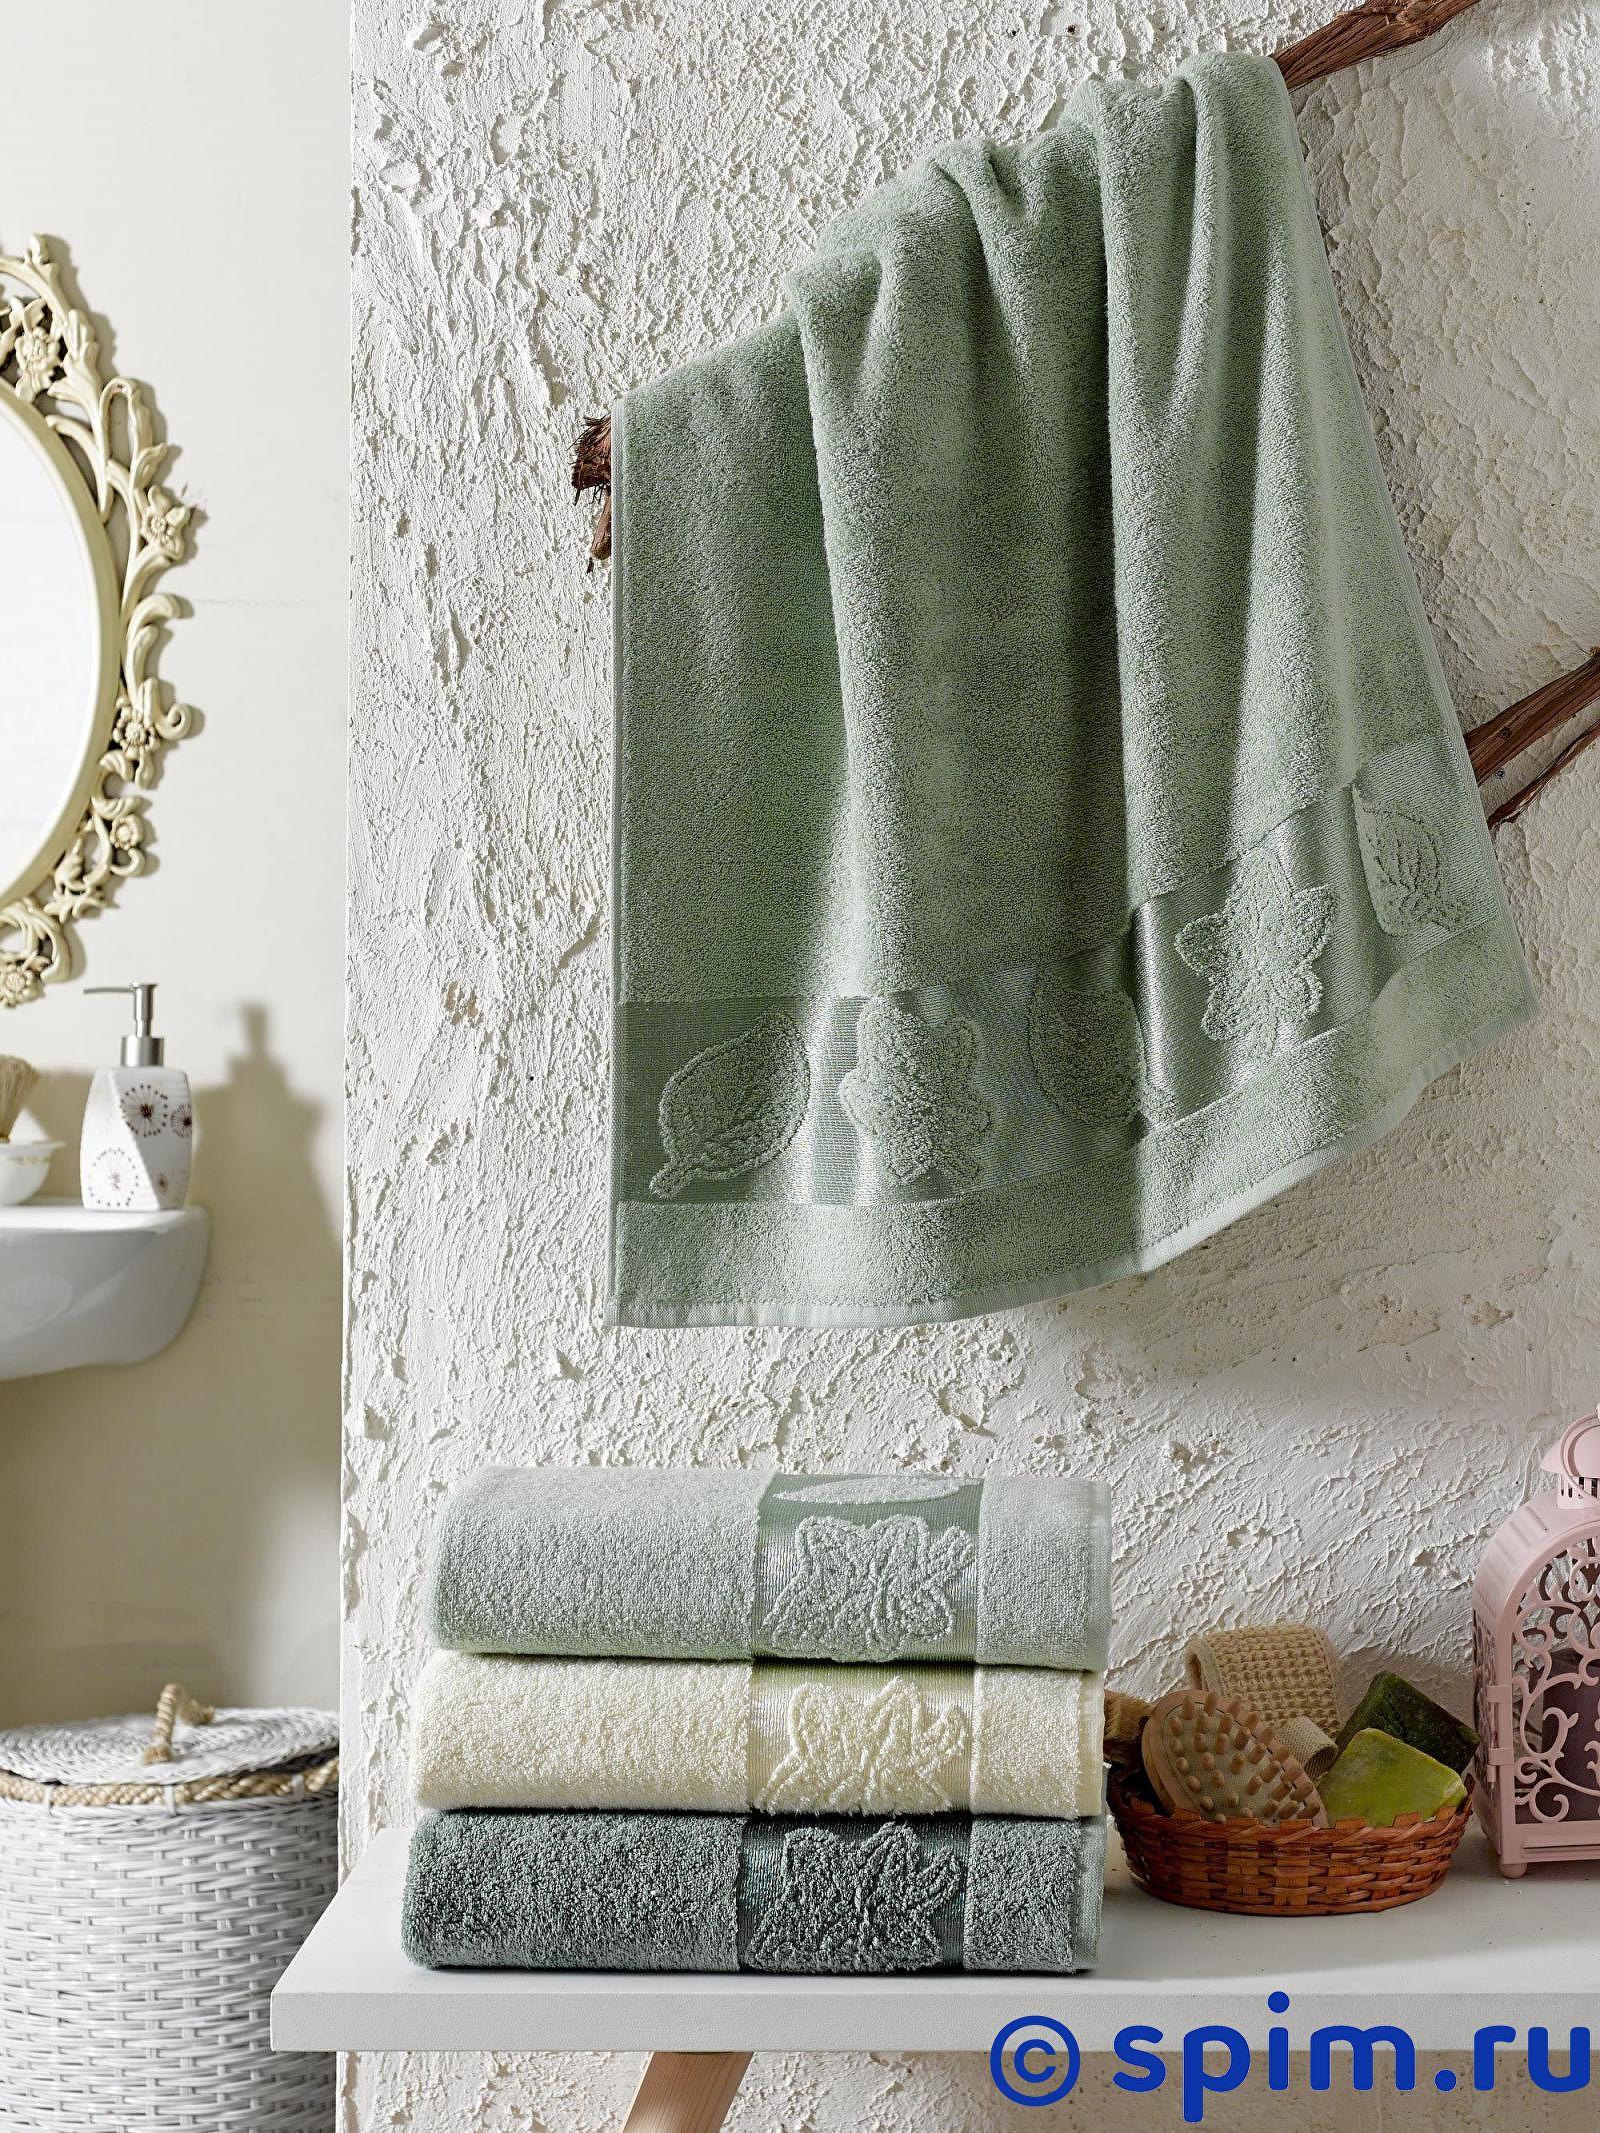 Набор из 4-х полотенец Do&co Alicia 70х140 см полотенца do n co полотенце lady цвет мятный набор